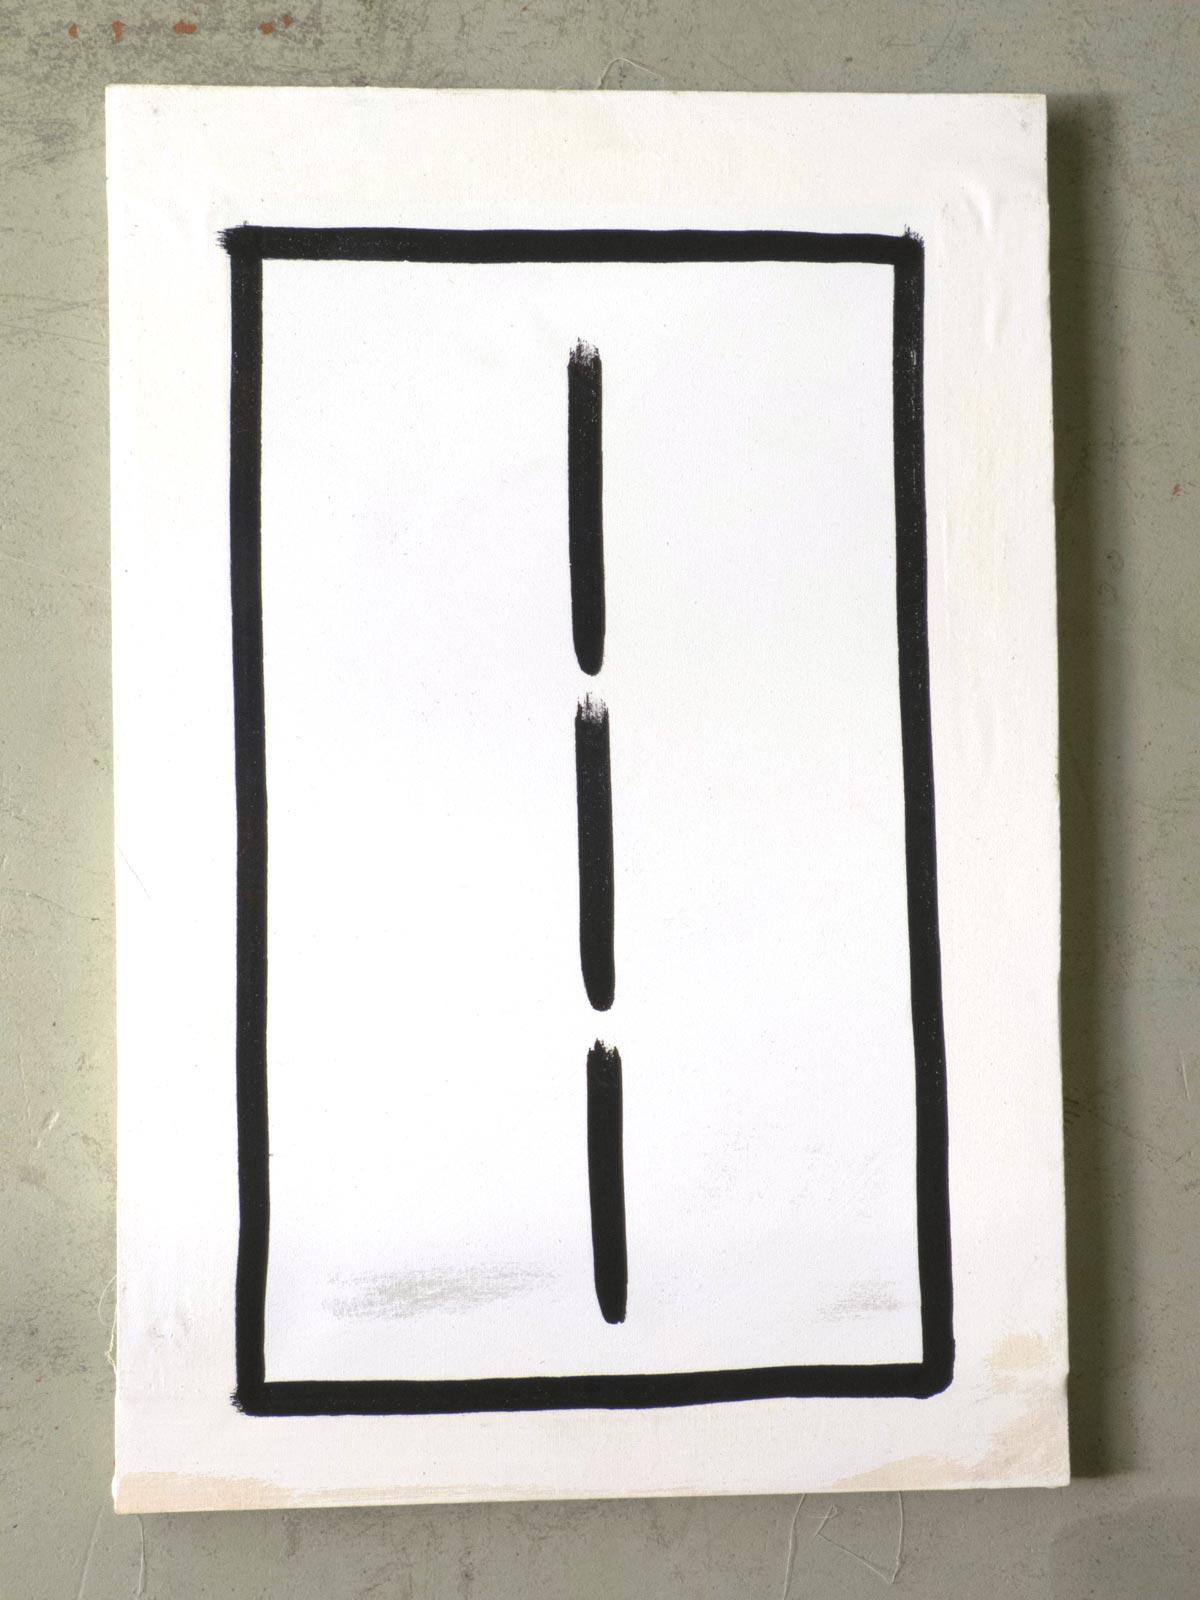 Urban-Manegold-There-is-no-Private-Privatleben-Privatsphäre-Rauminstallation-Experiment-Typographie-Portrait-Gesellschaft-Licht-Kunst-Transparent-LED-Madlight-portrait_multiplex_1